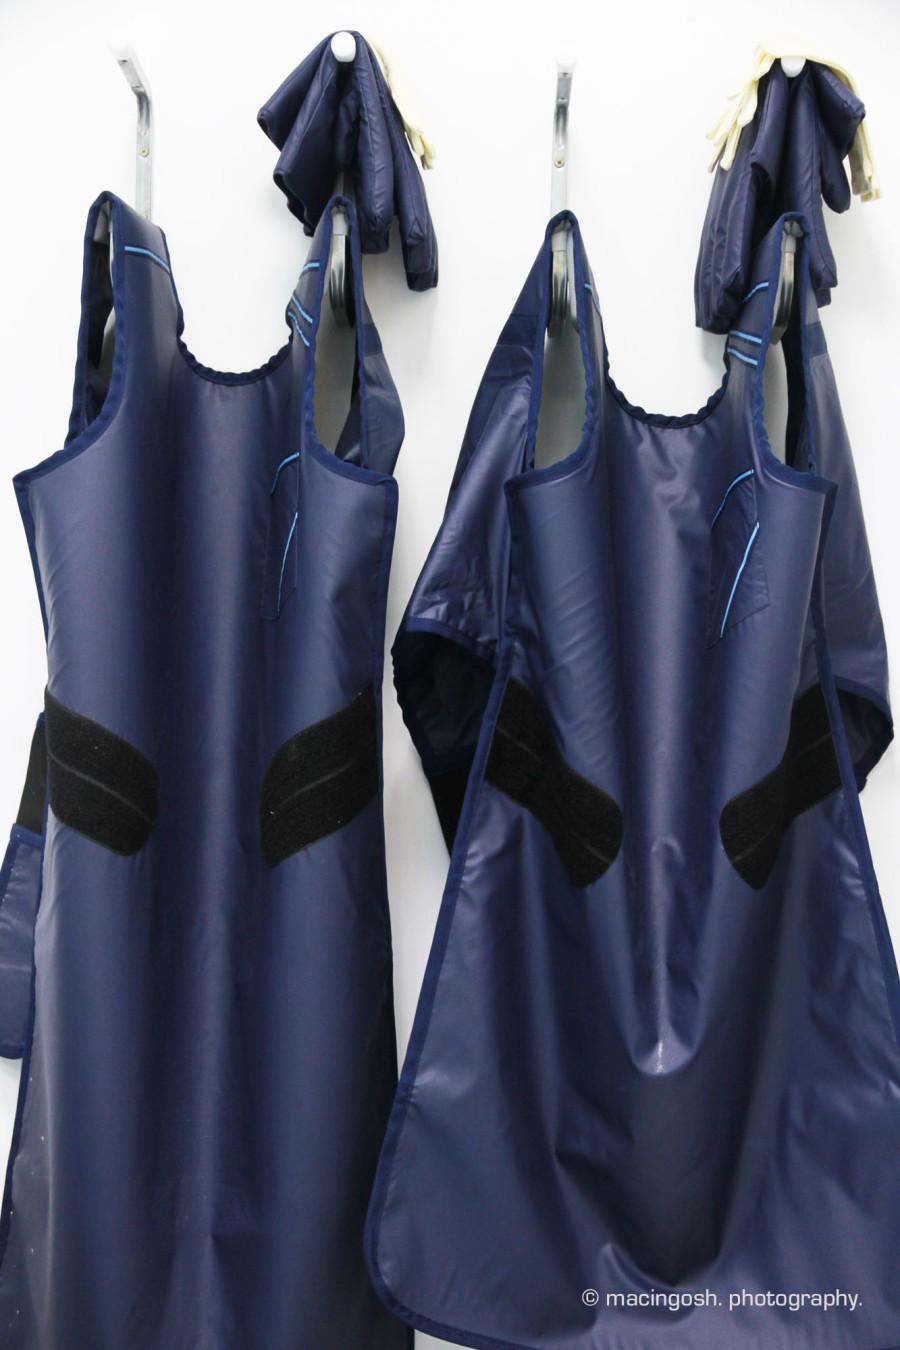 roentgenschutzkleidung, x-ray protection clothing, macingosh photography, munich